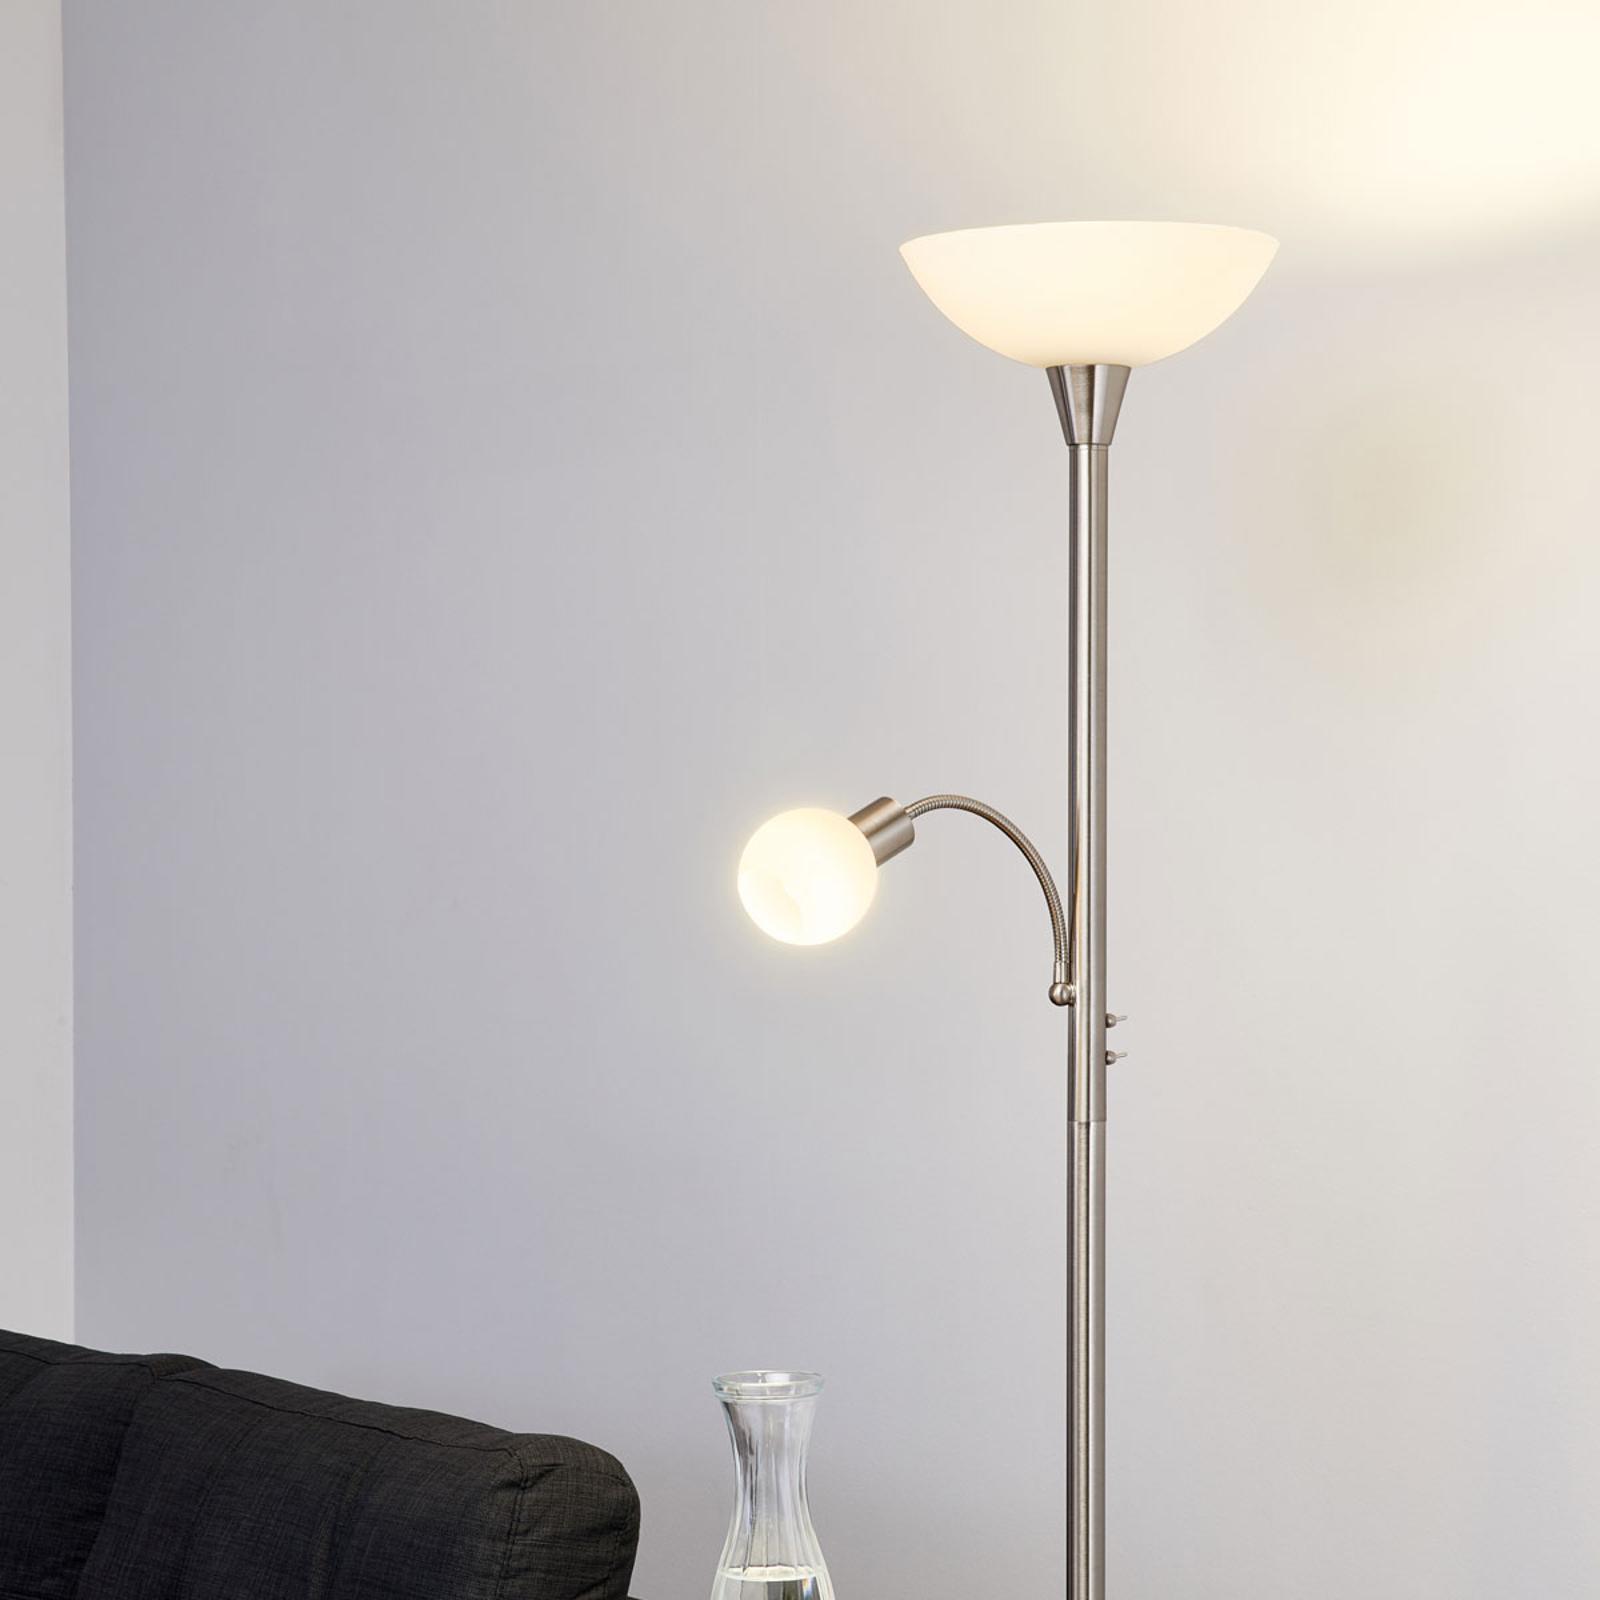 Lampadaire LED Elaina à 2 lampes nickel mat